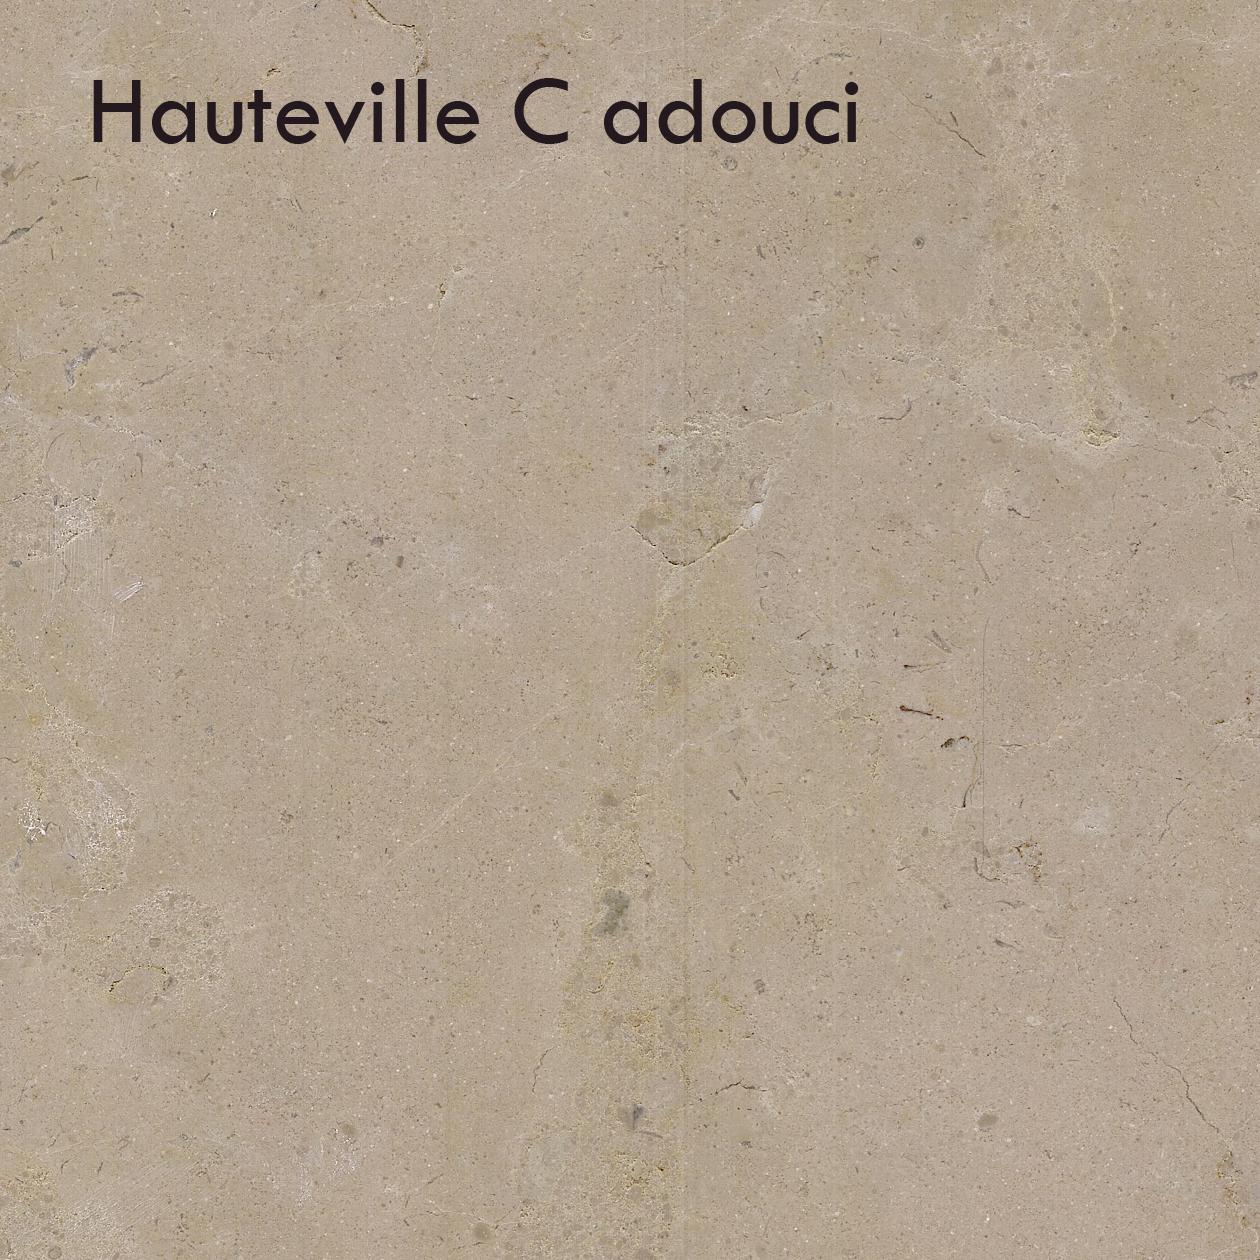 Hauteville C adouci